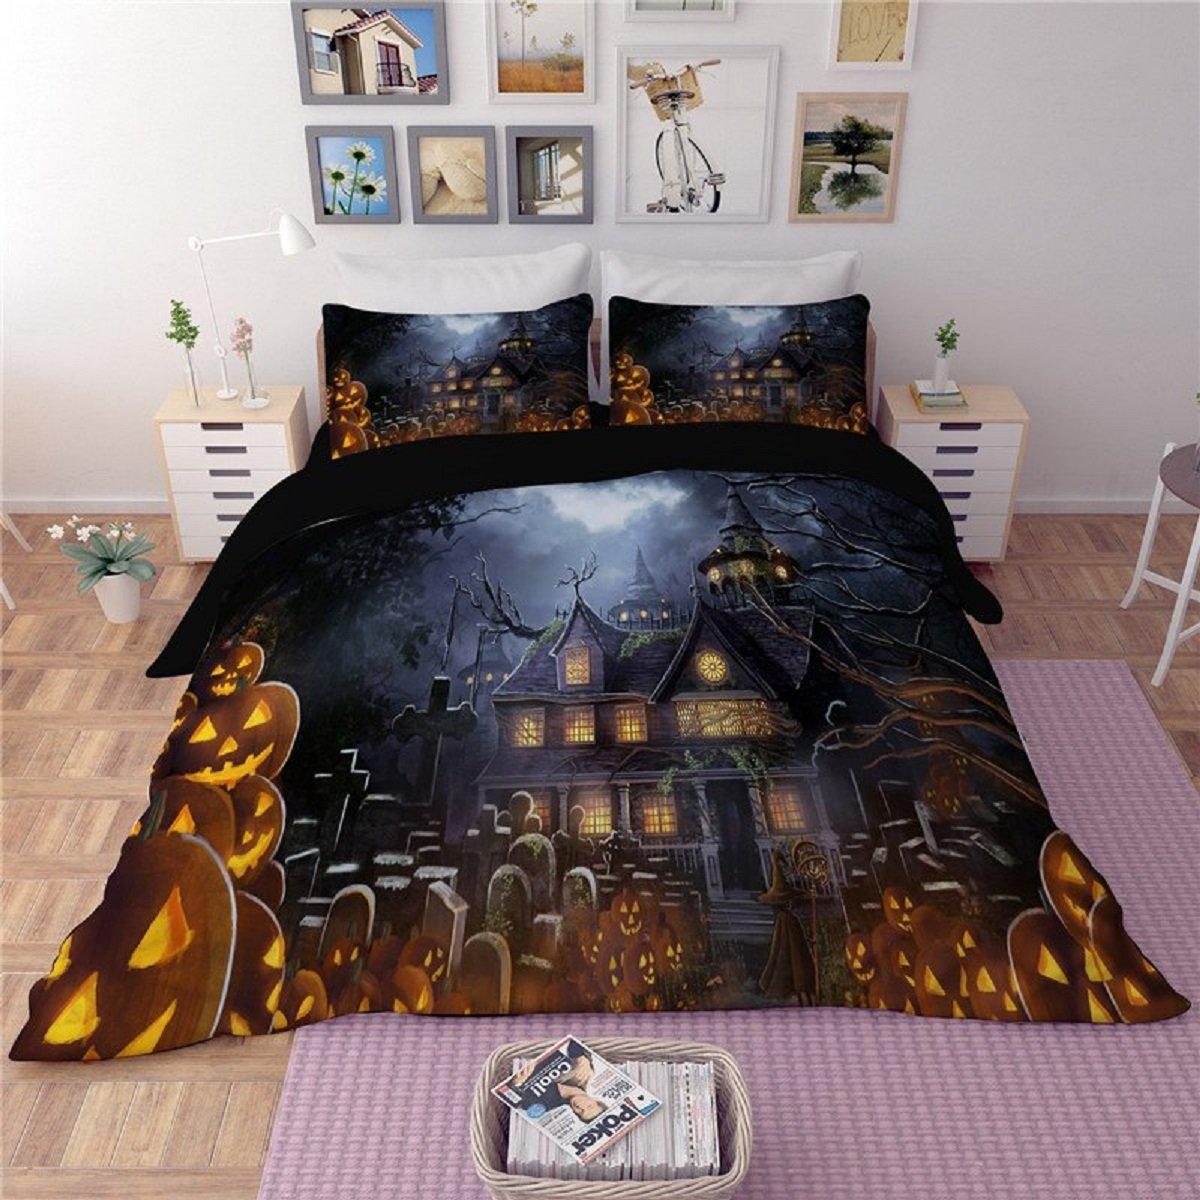 The Creepy Halloween House Duvet Bedding Set